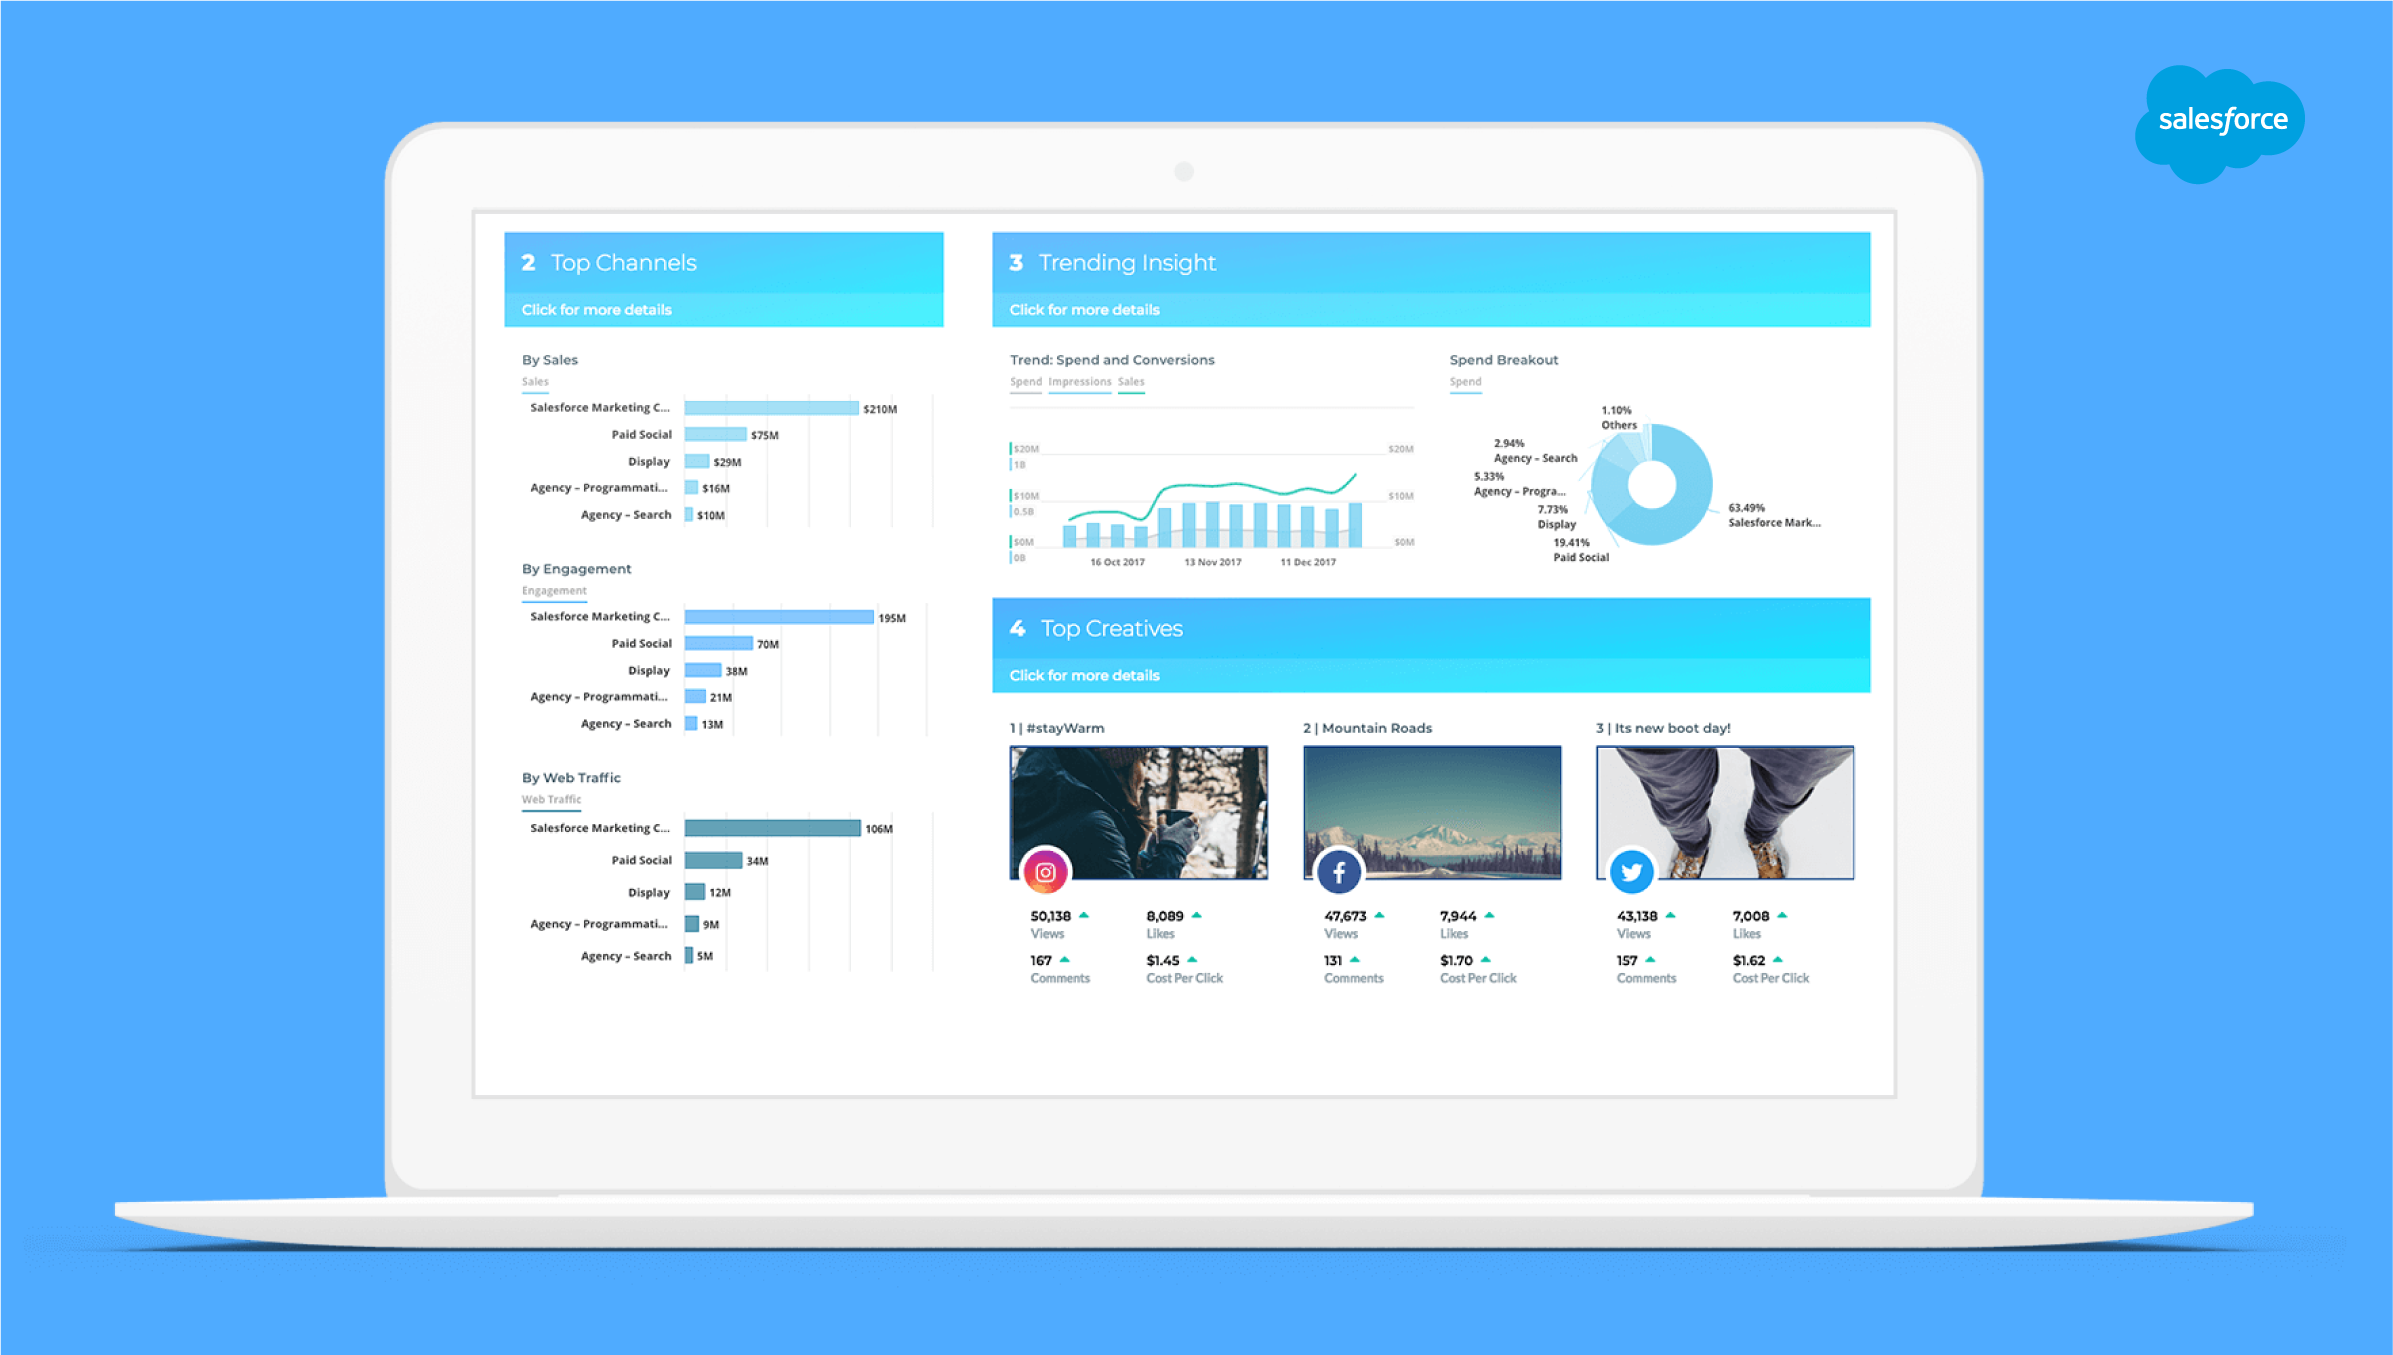 Imagem do dashboard da plataforma Datorama